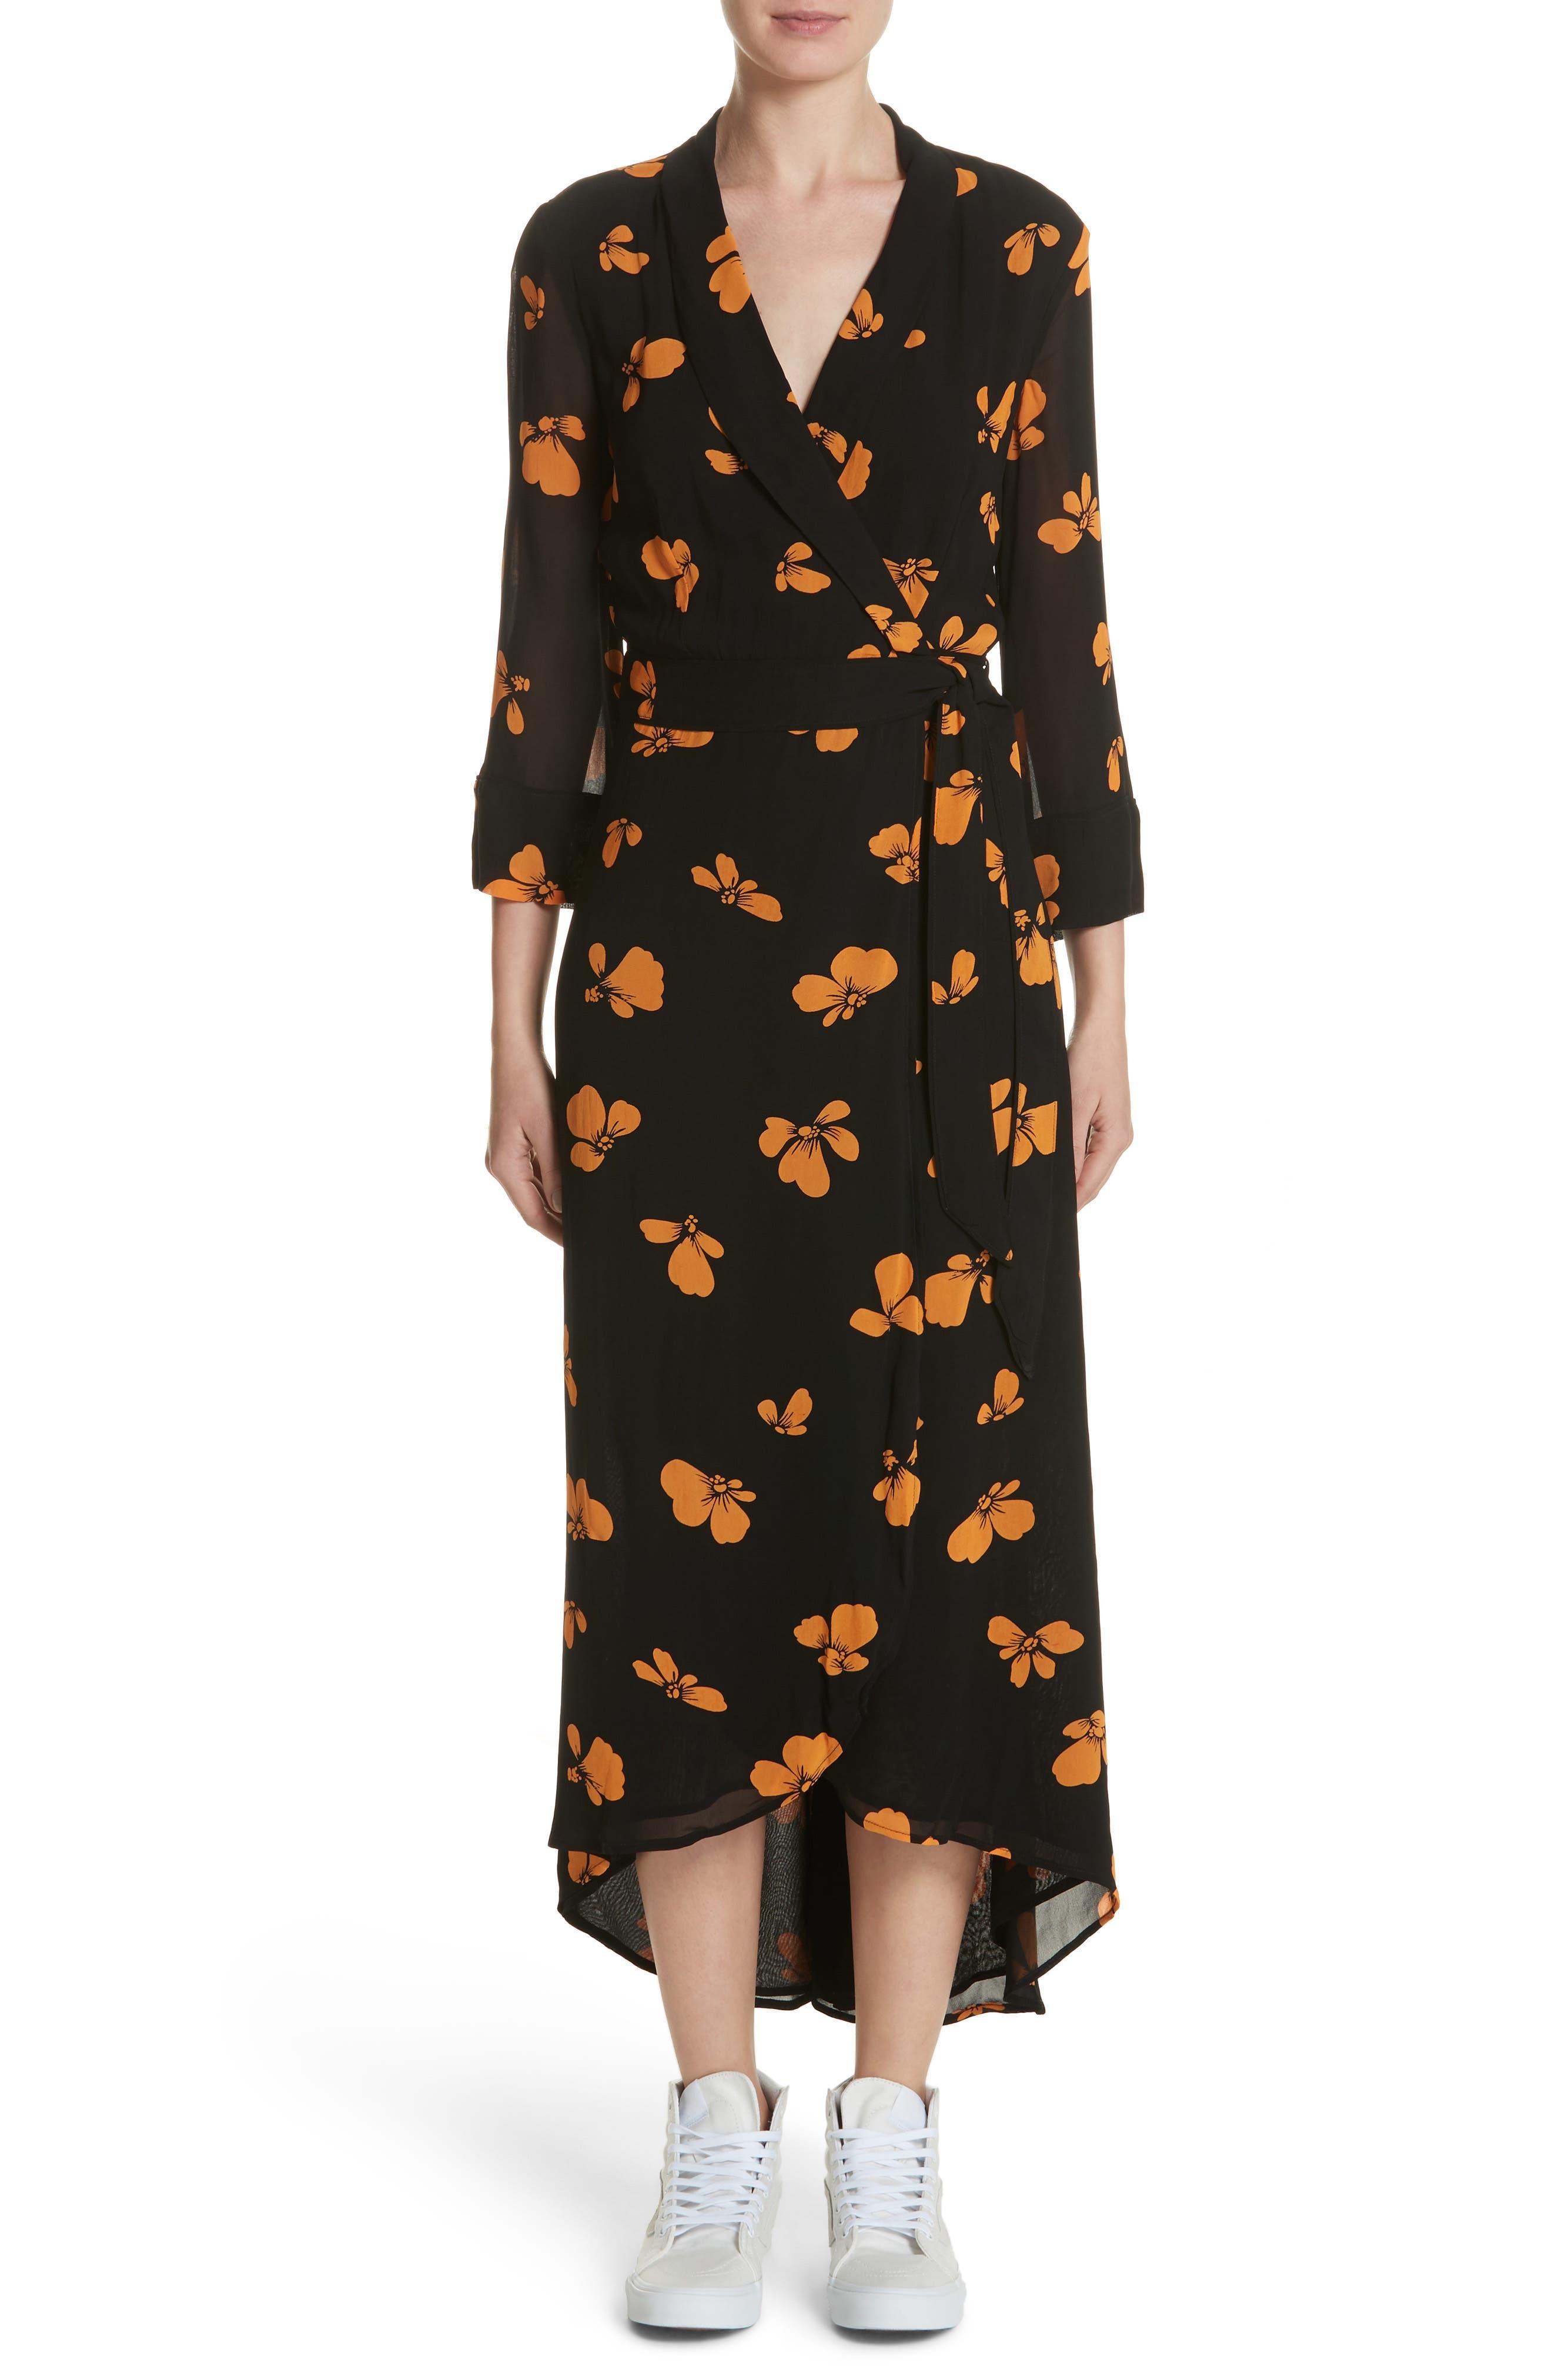 Fairfax Georgette Wrap Dress,                             Main thumbnail 1, color,                             001